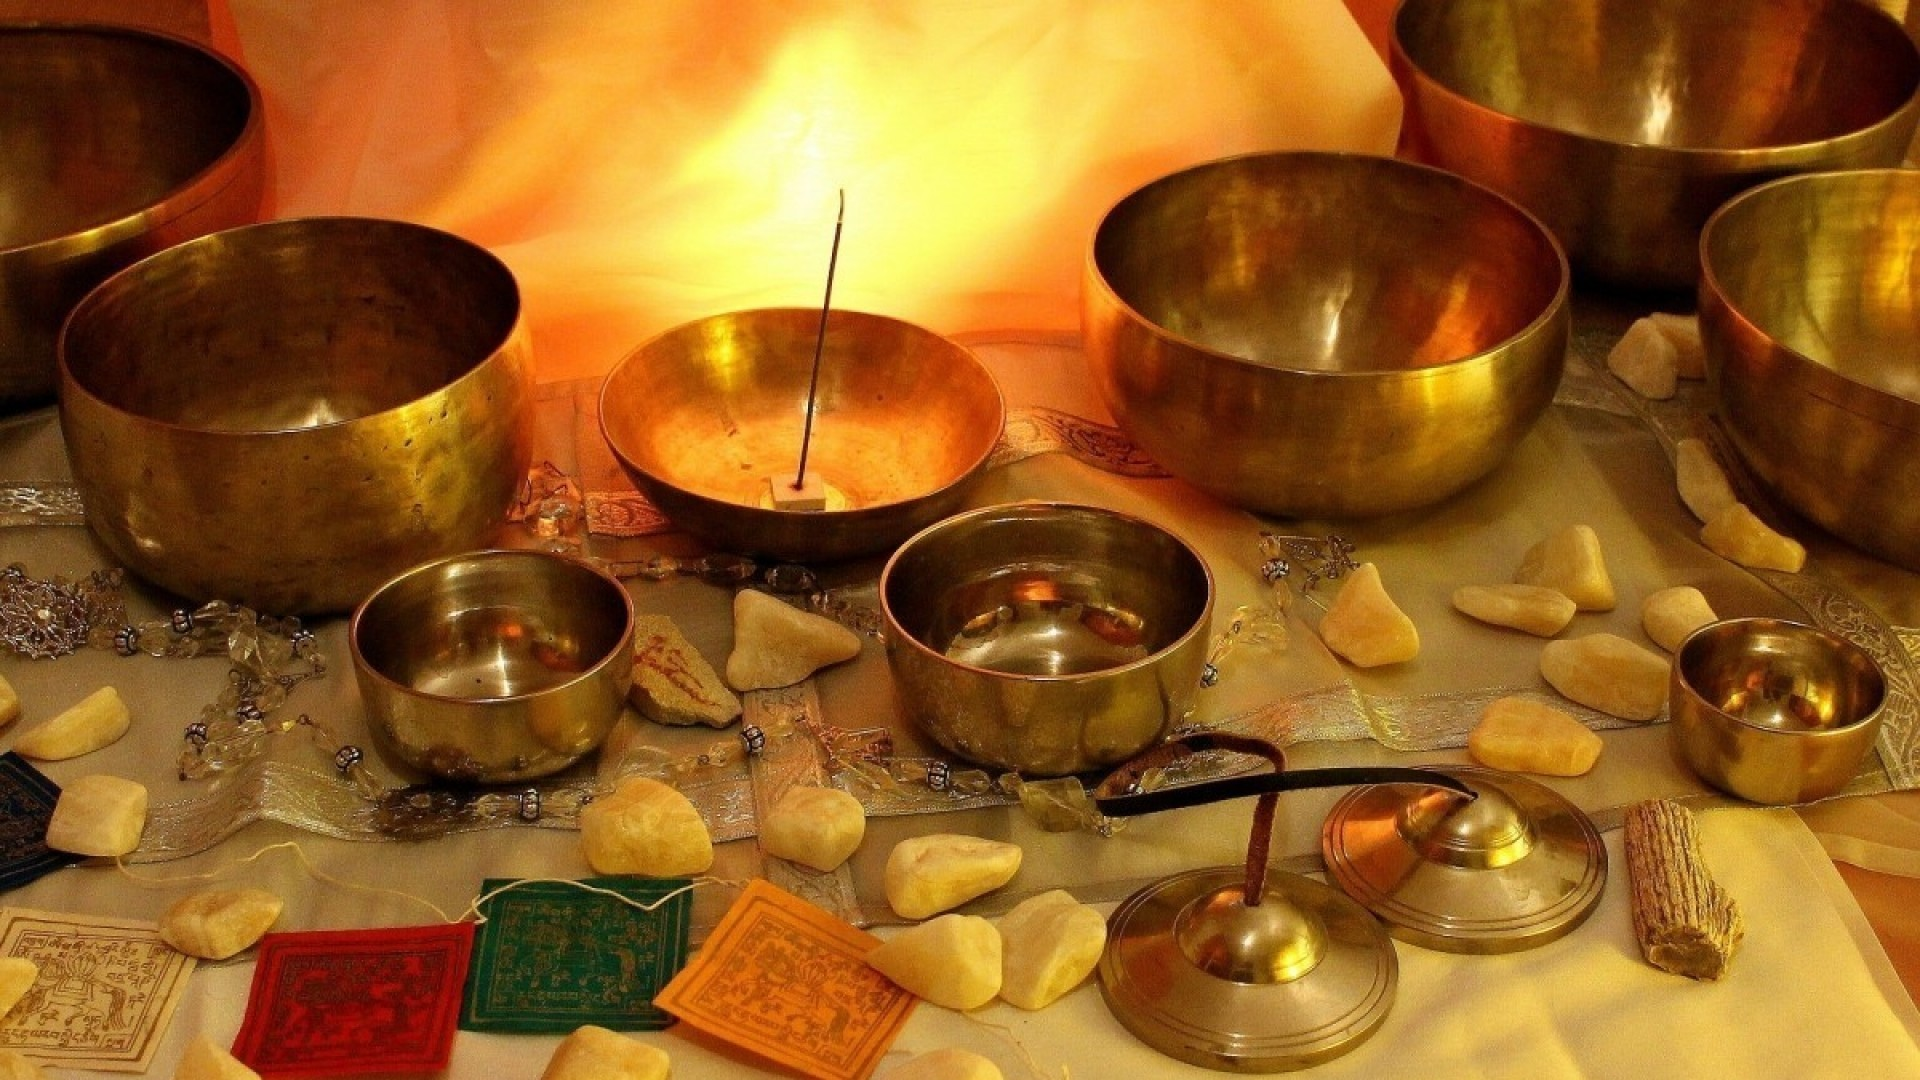 Музыка для релакса: тибетская чаша